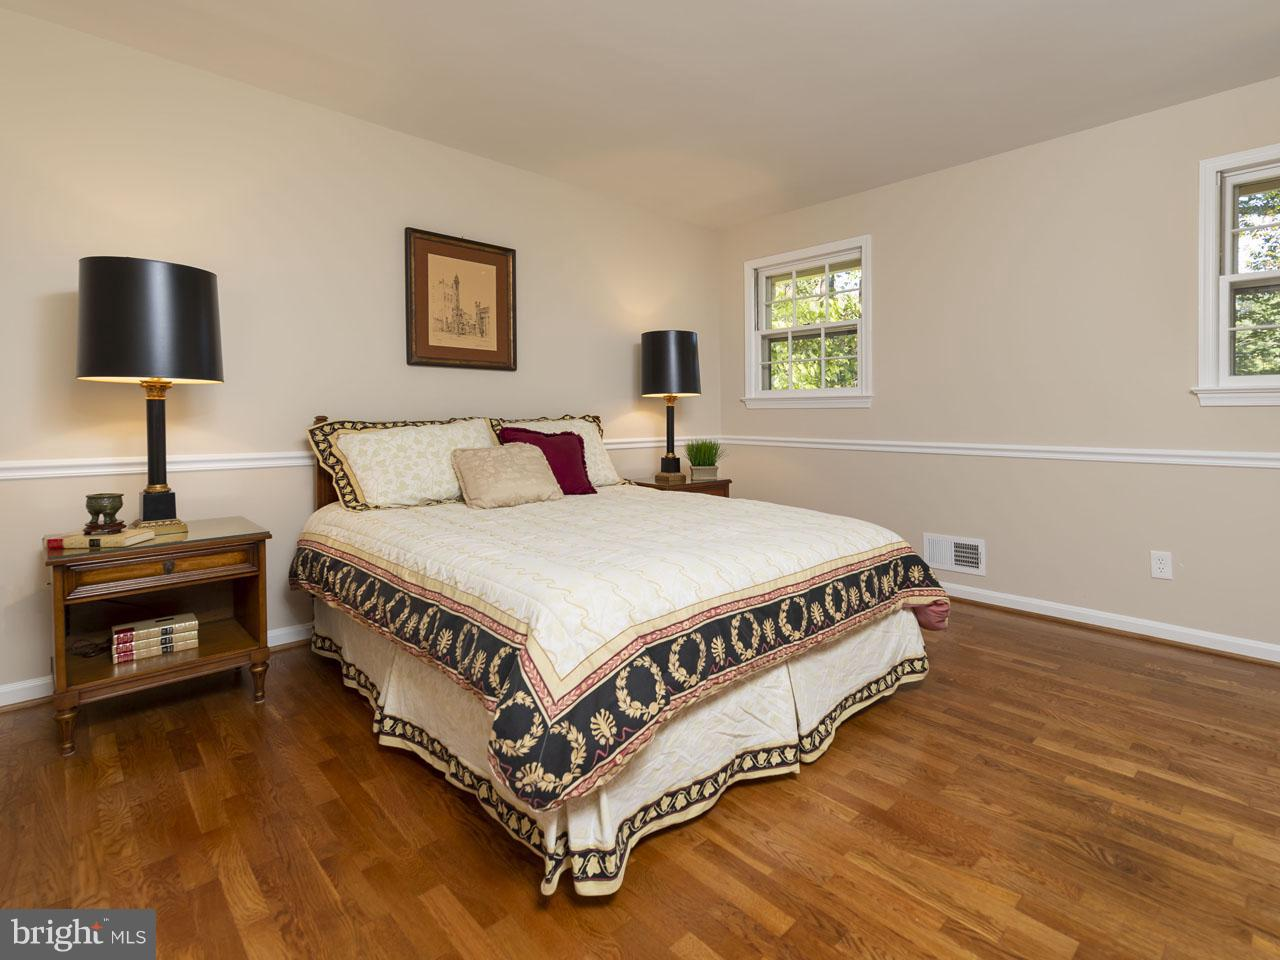 1010014728-300953032684-2021-09-05-13-50-25  |   | Annandale Delaware Real Estate For Sale | MLS# 1010014728  - Best of Northern Virginia